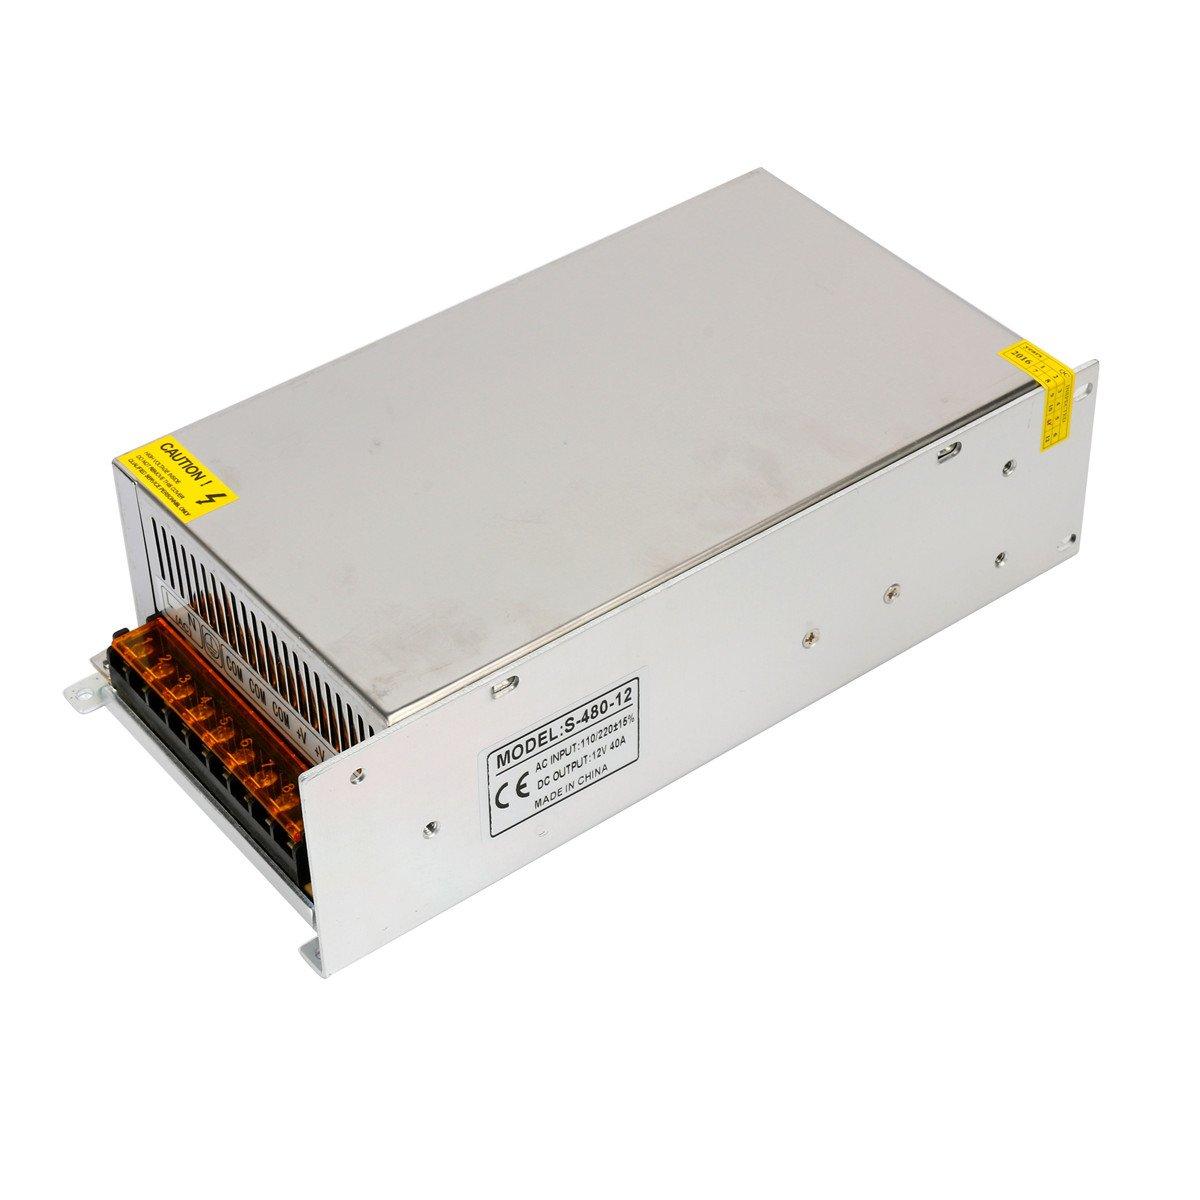 Yaetek AC110V/220V to DC12V 40A 480W Switch Power Supply Driver for LED Light